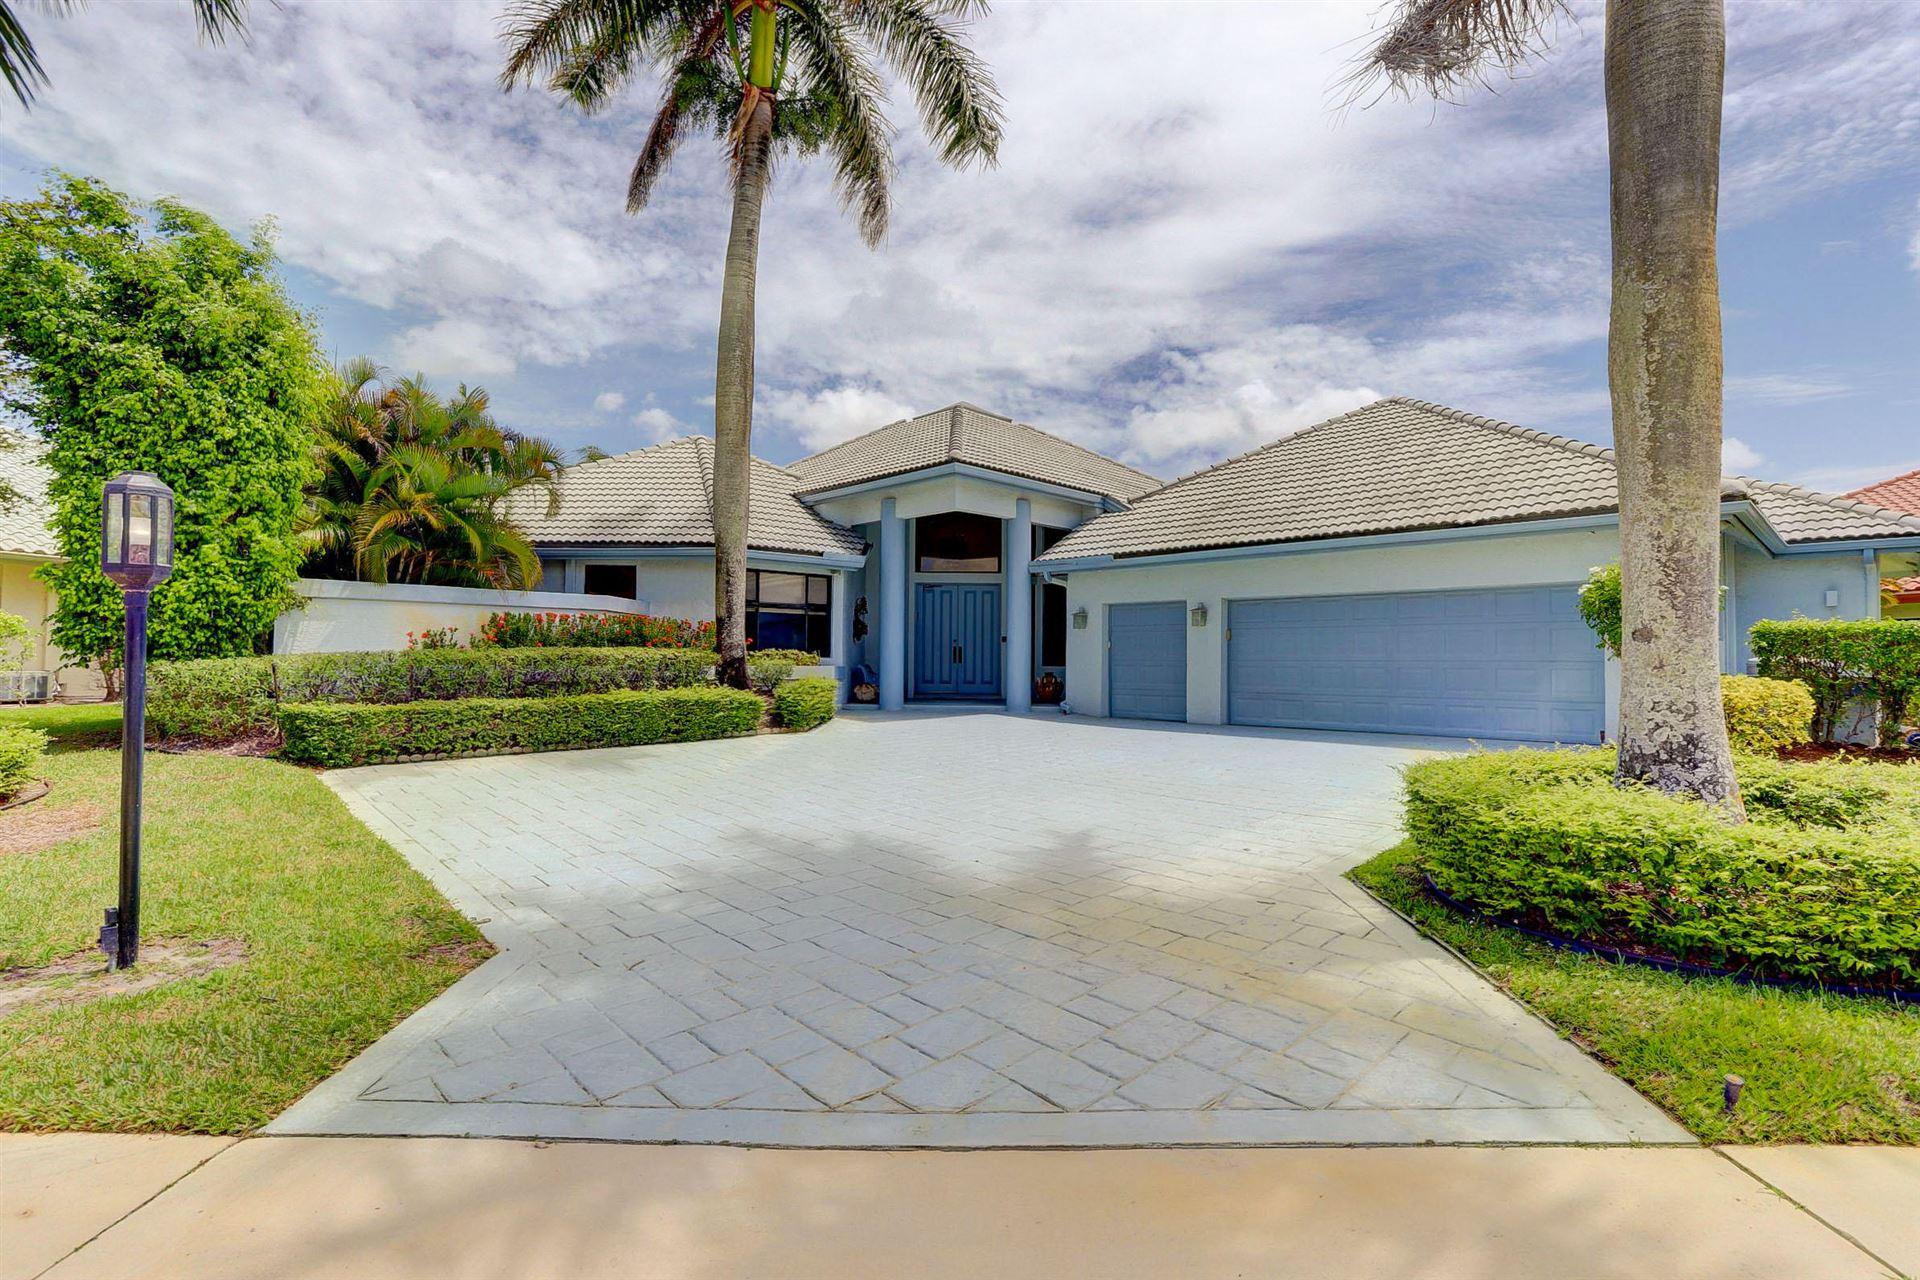 10743 Stonebridge Boulevard, Boca Raton, FL 33498 - MLS#: RX-10722993